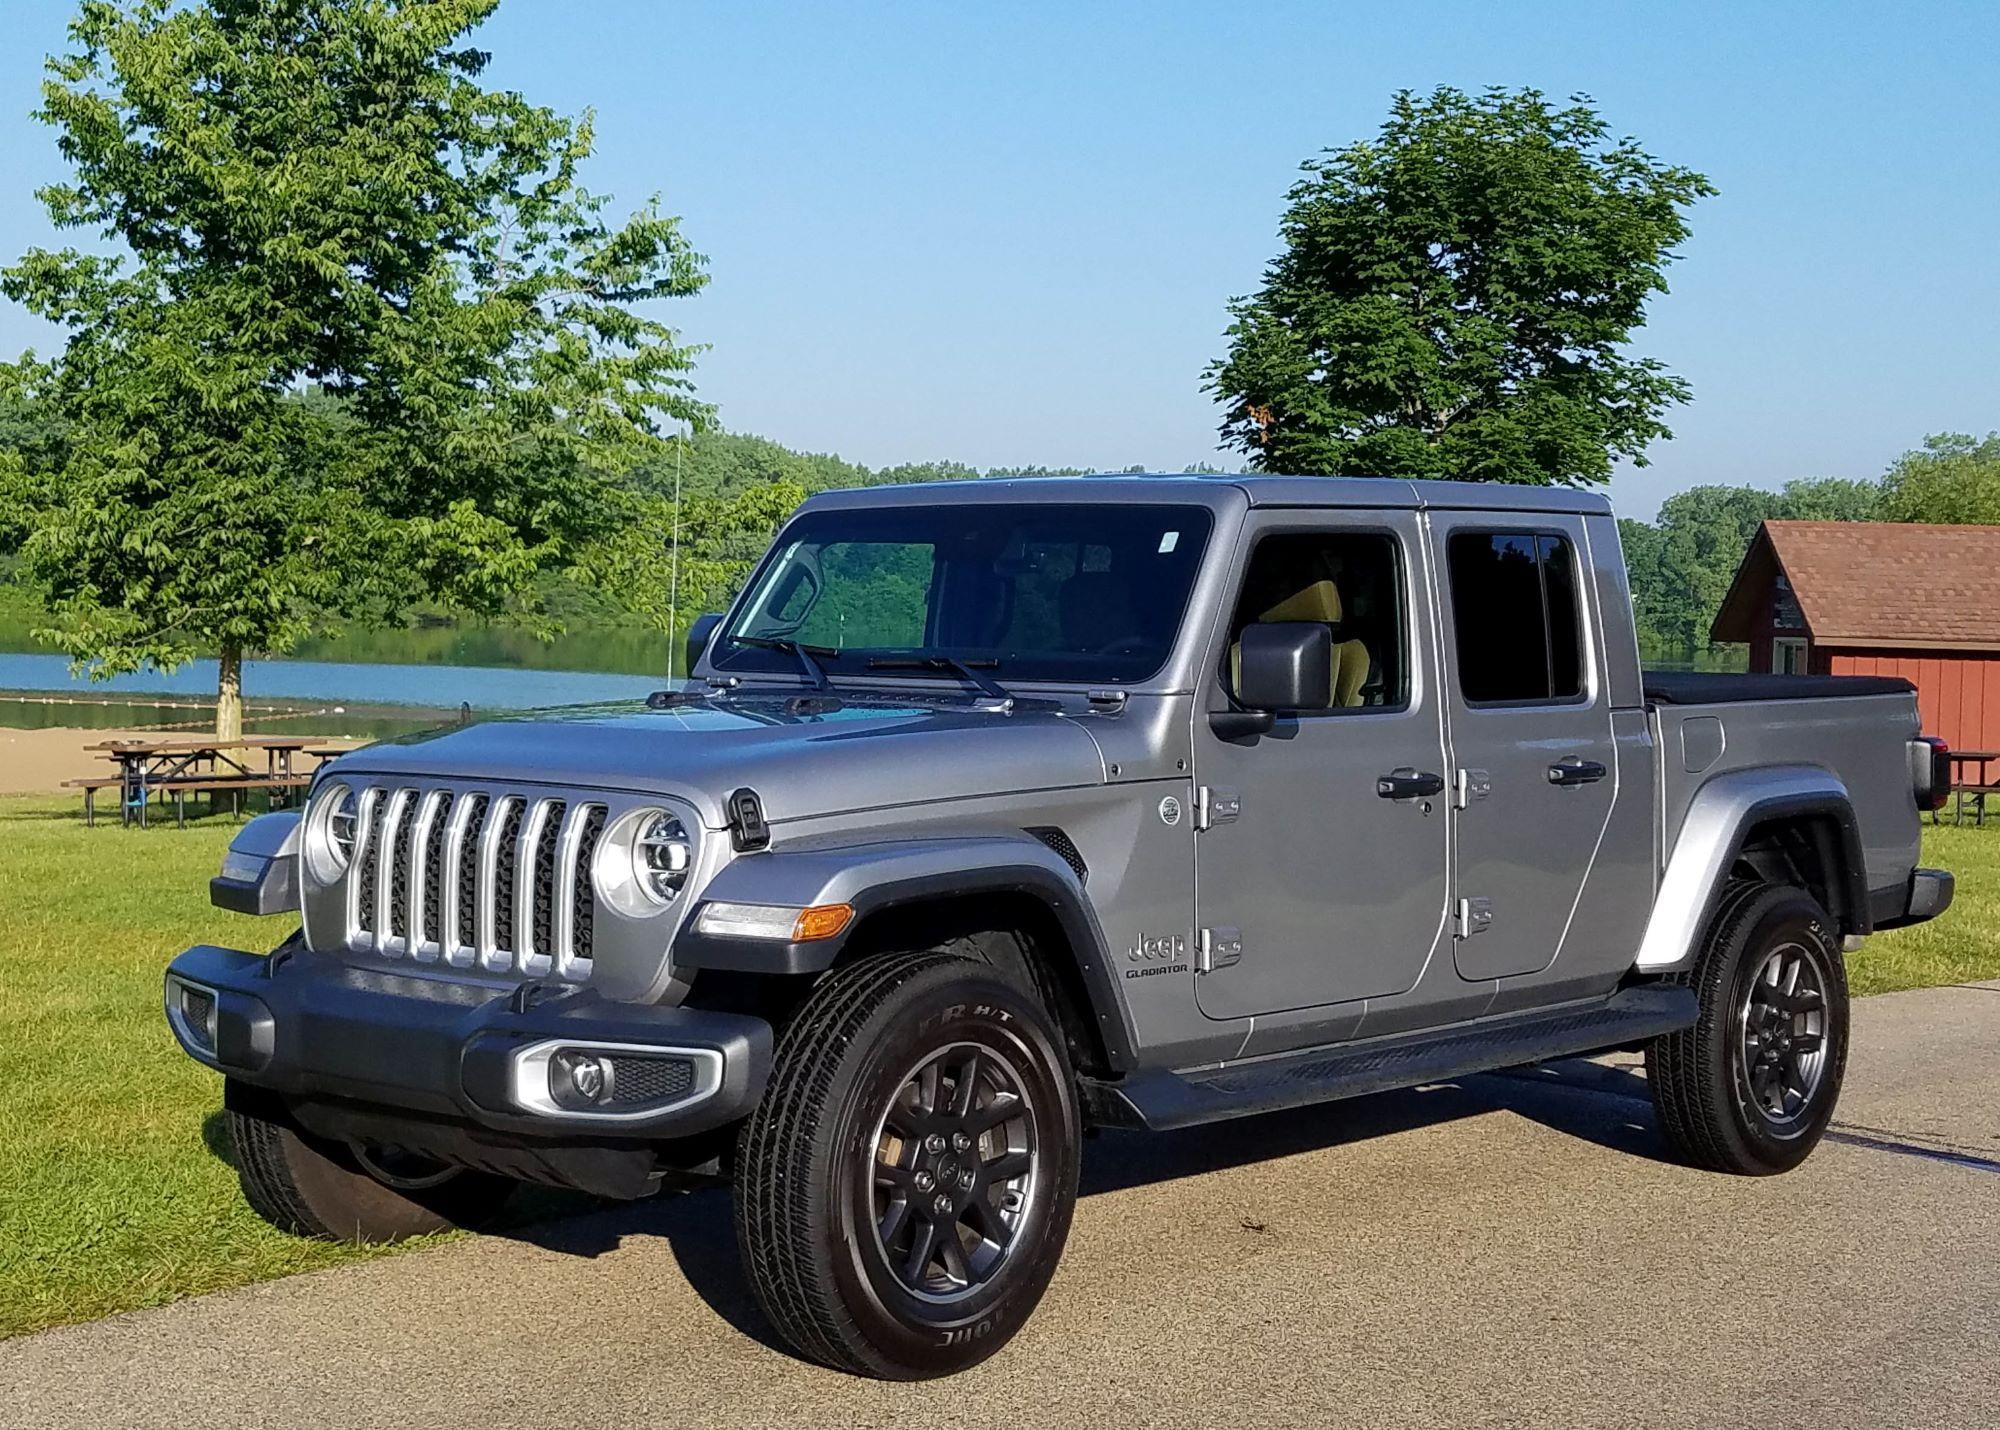 2020 Jeep Gladiator Overland 4x4 Review Wuwm